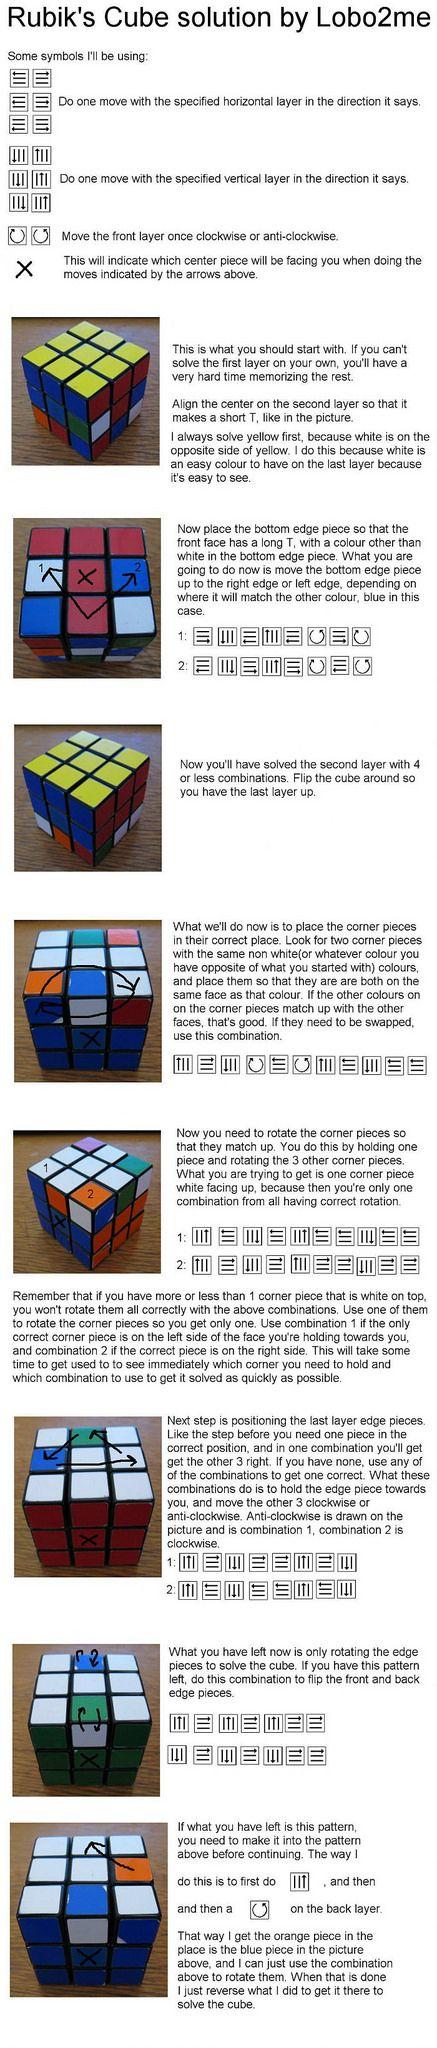 dLifeHax: Rubik's Cube Solution by Lobo2me